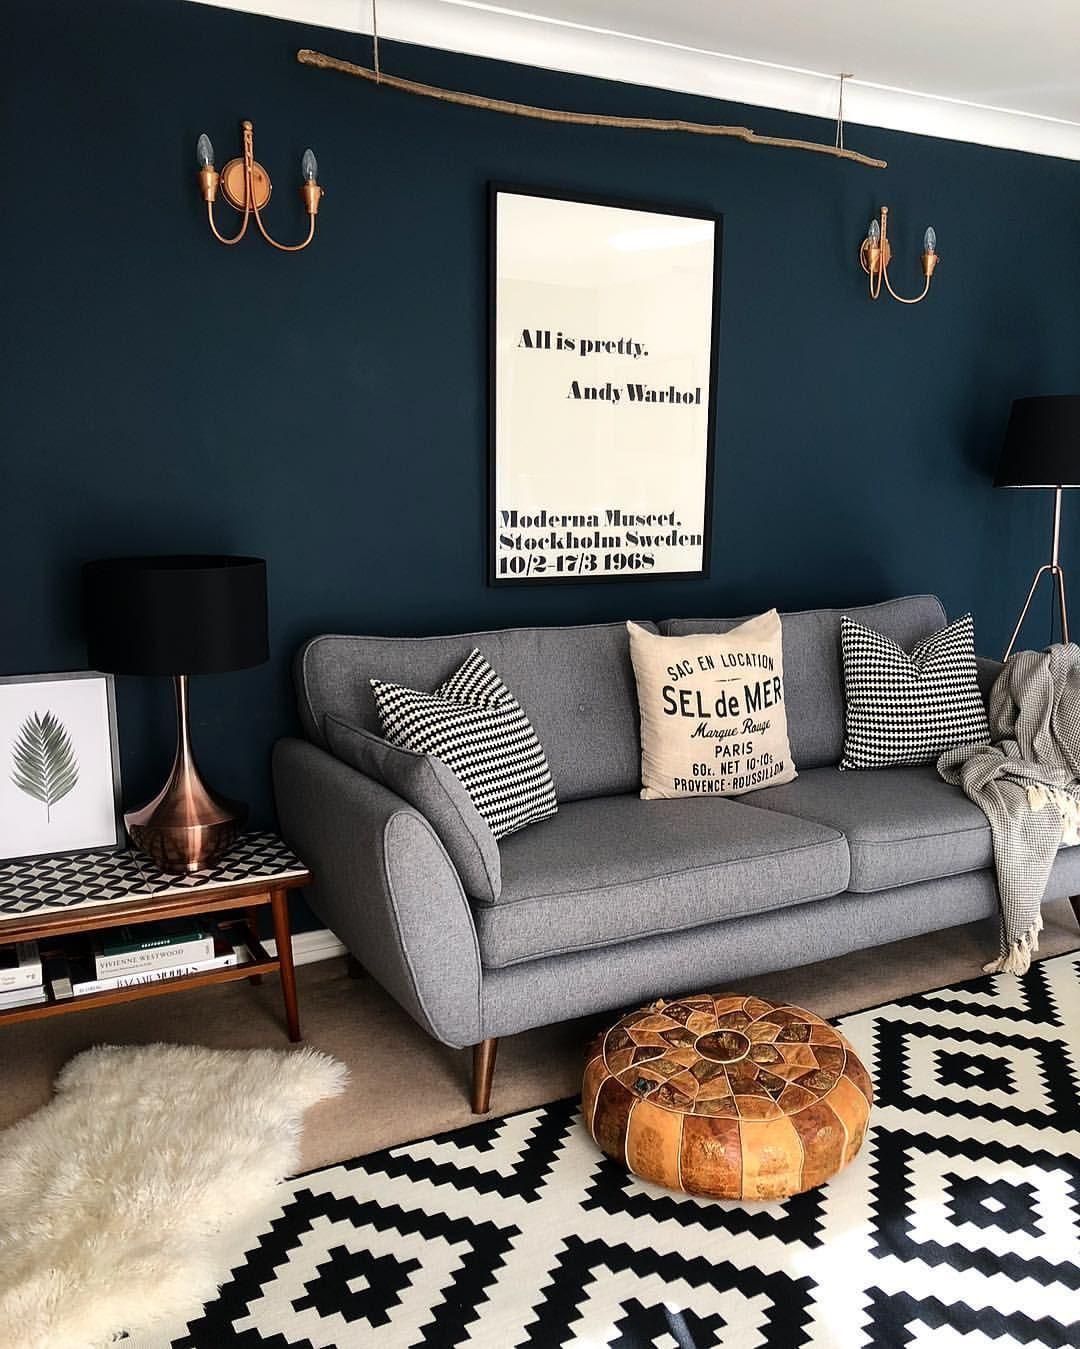 Wall Color Livingroompaintcolorideas Dark Walls Living Room